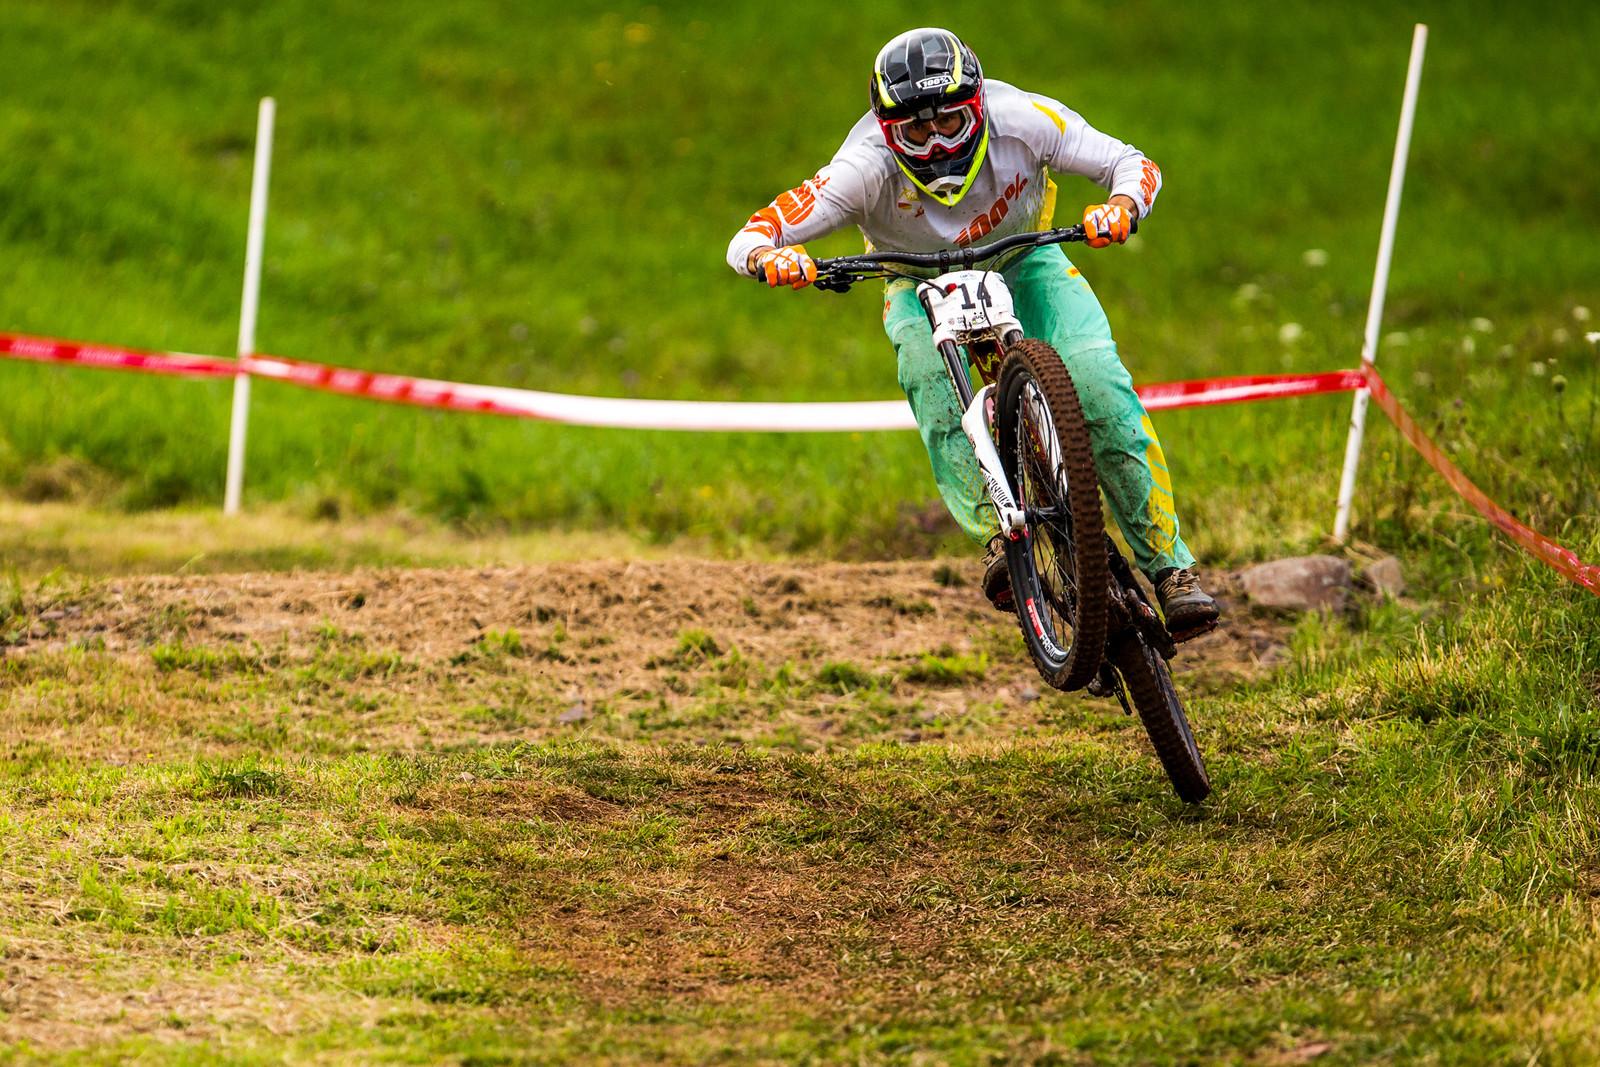 Jordan Newth - RACE DAY GALLERY - 2017 Pro GRT, Windham, NY - Mountain Biking Pictures - Vital MTB